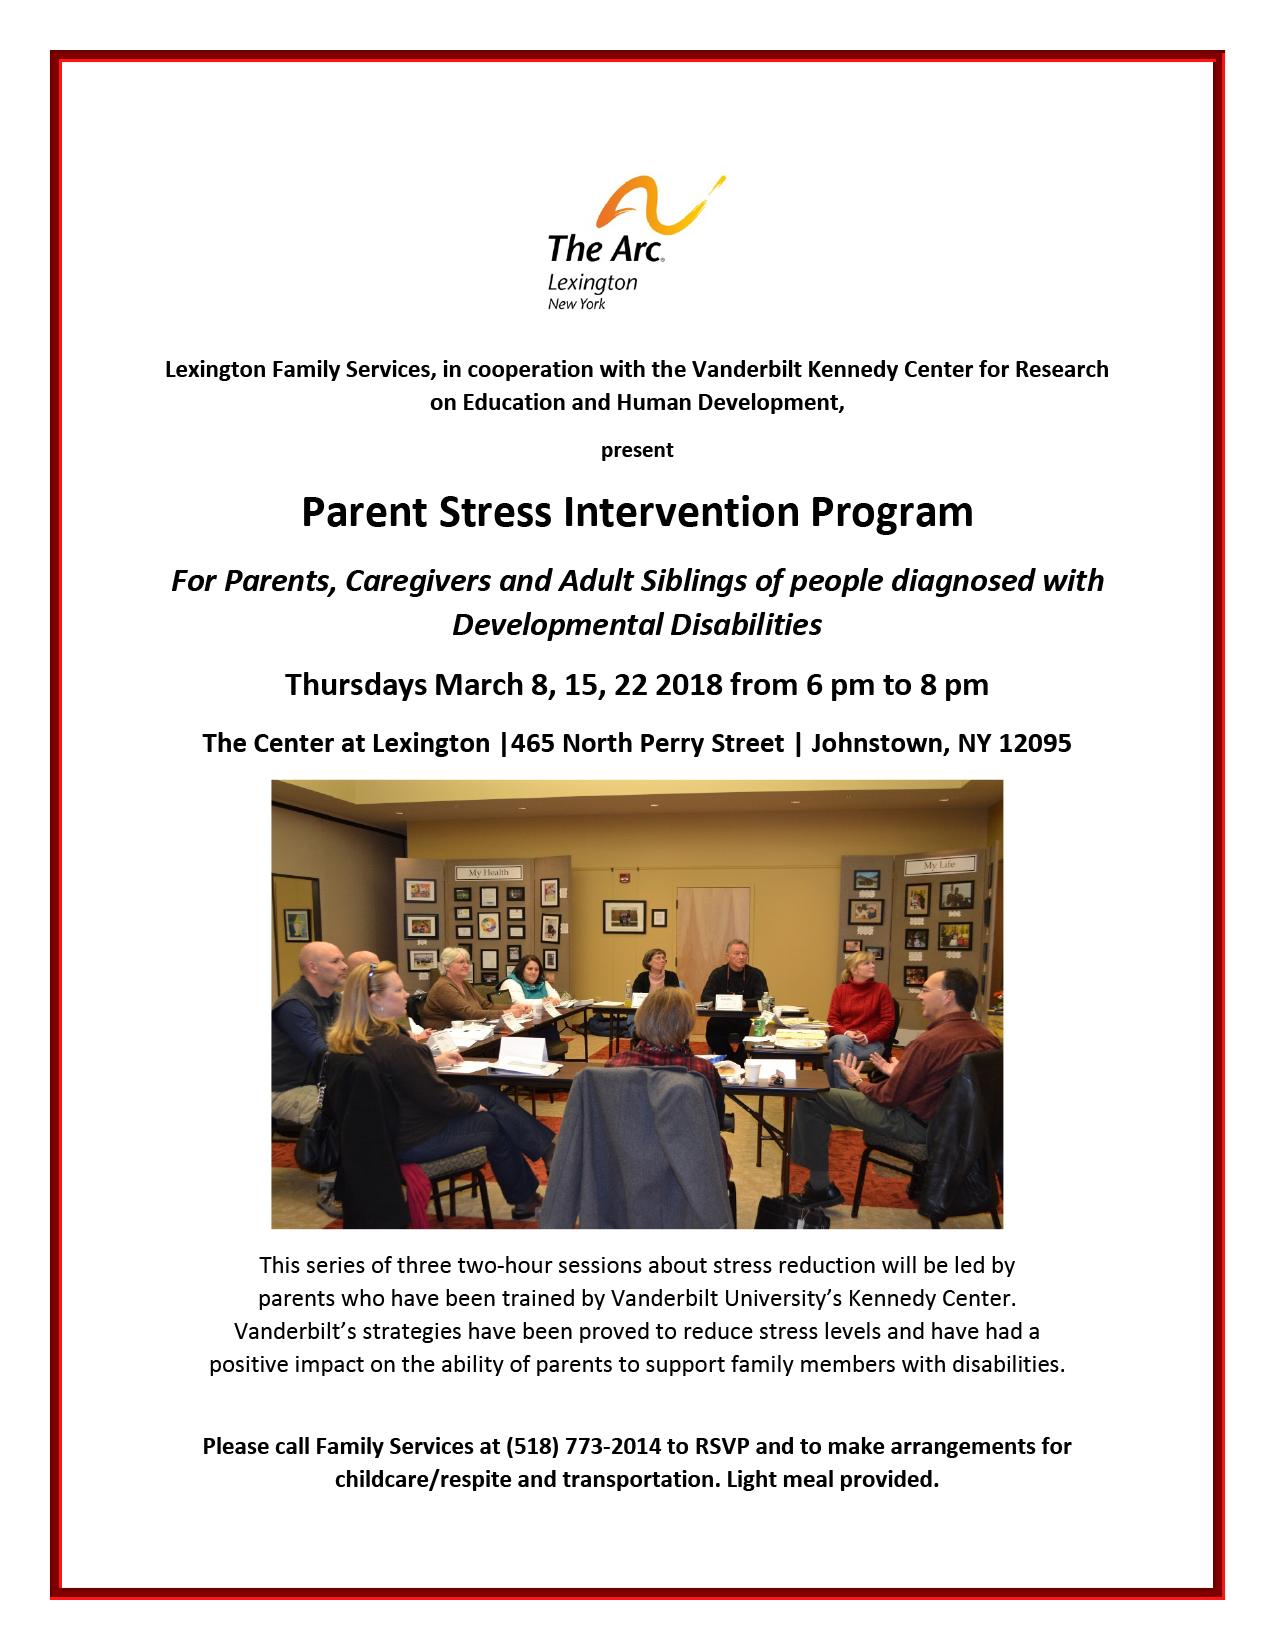 Parent Stress Intervention Program flier 2018.jpg